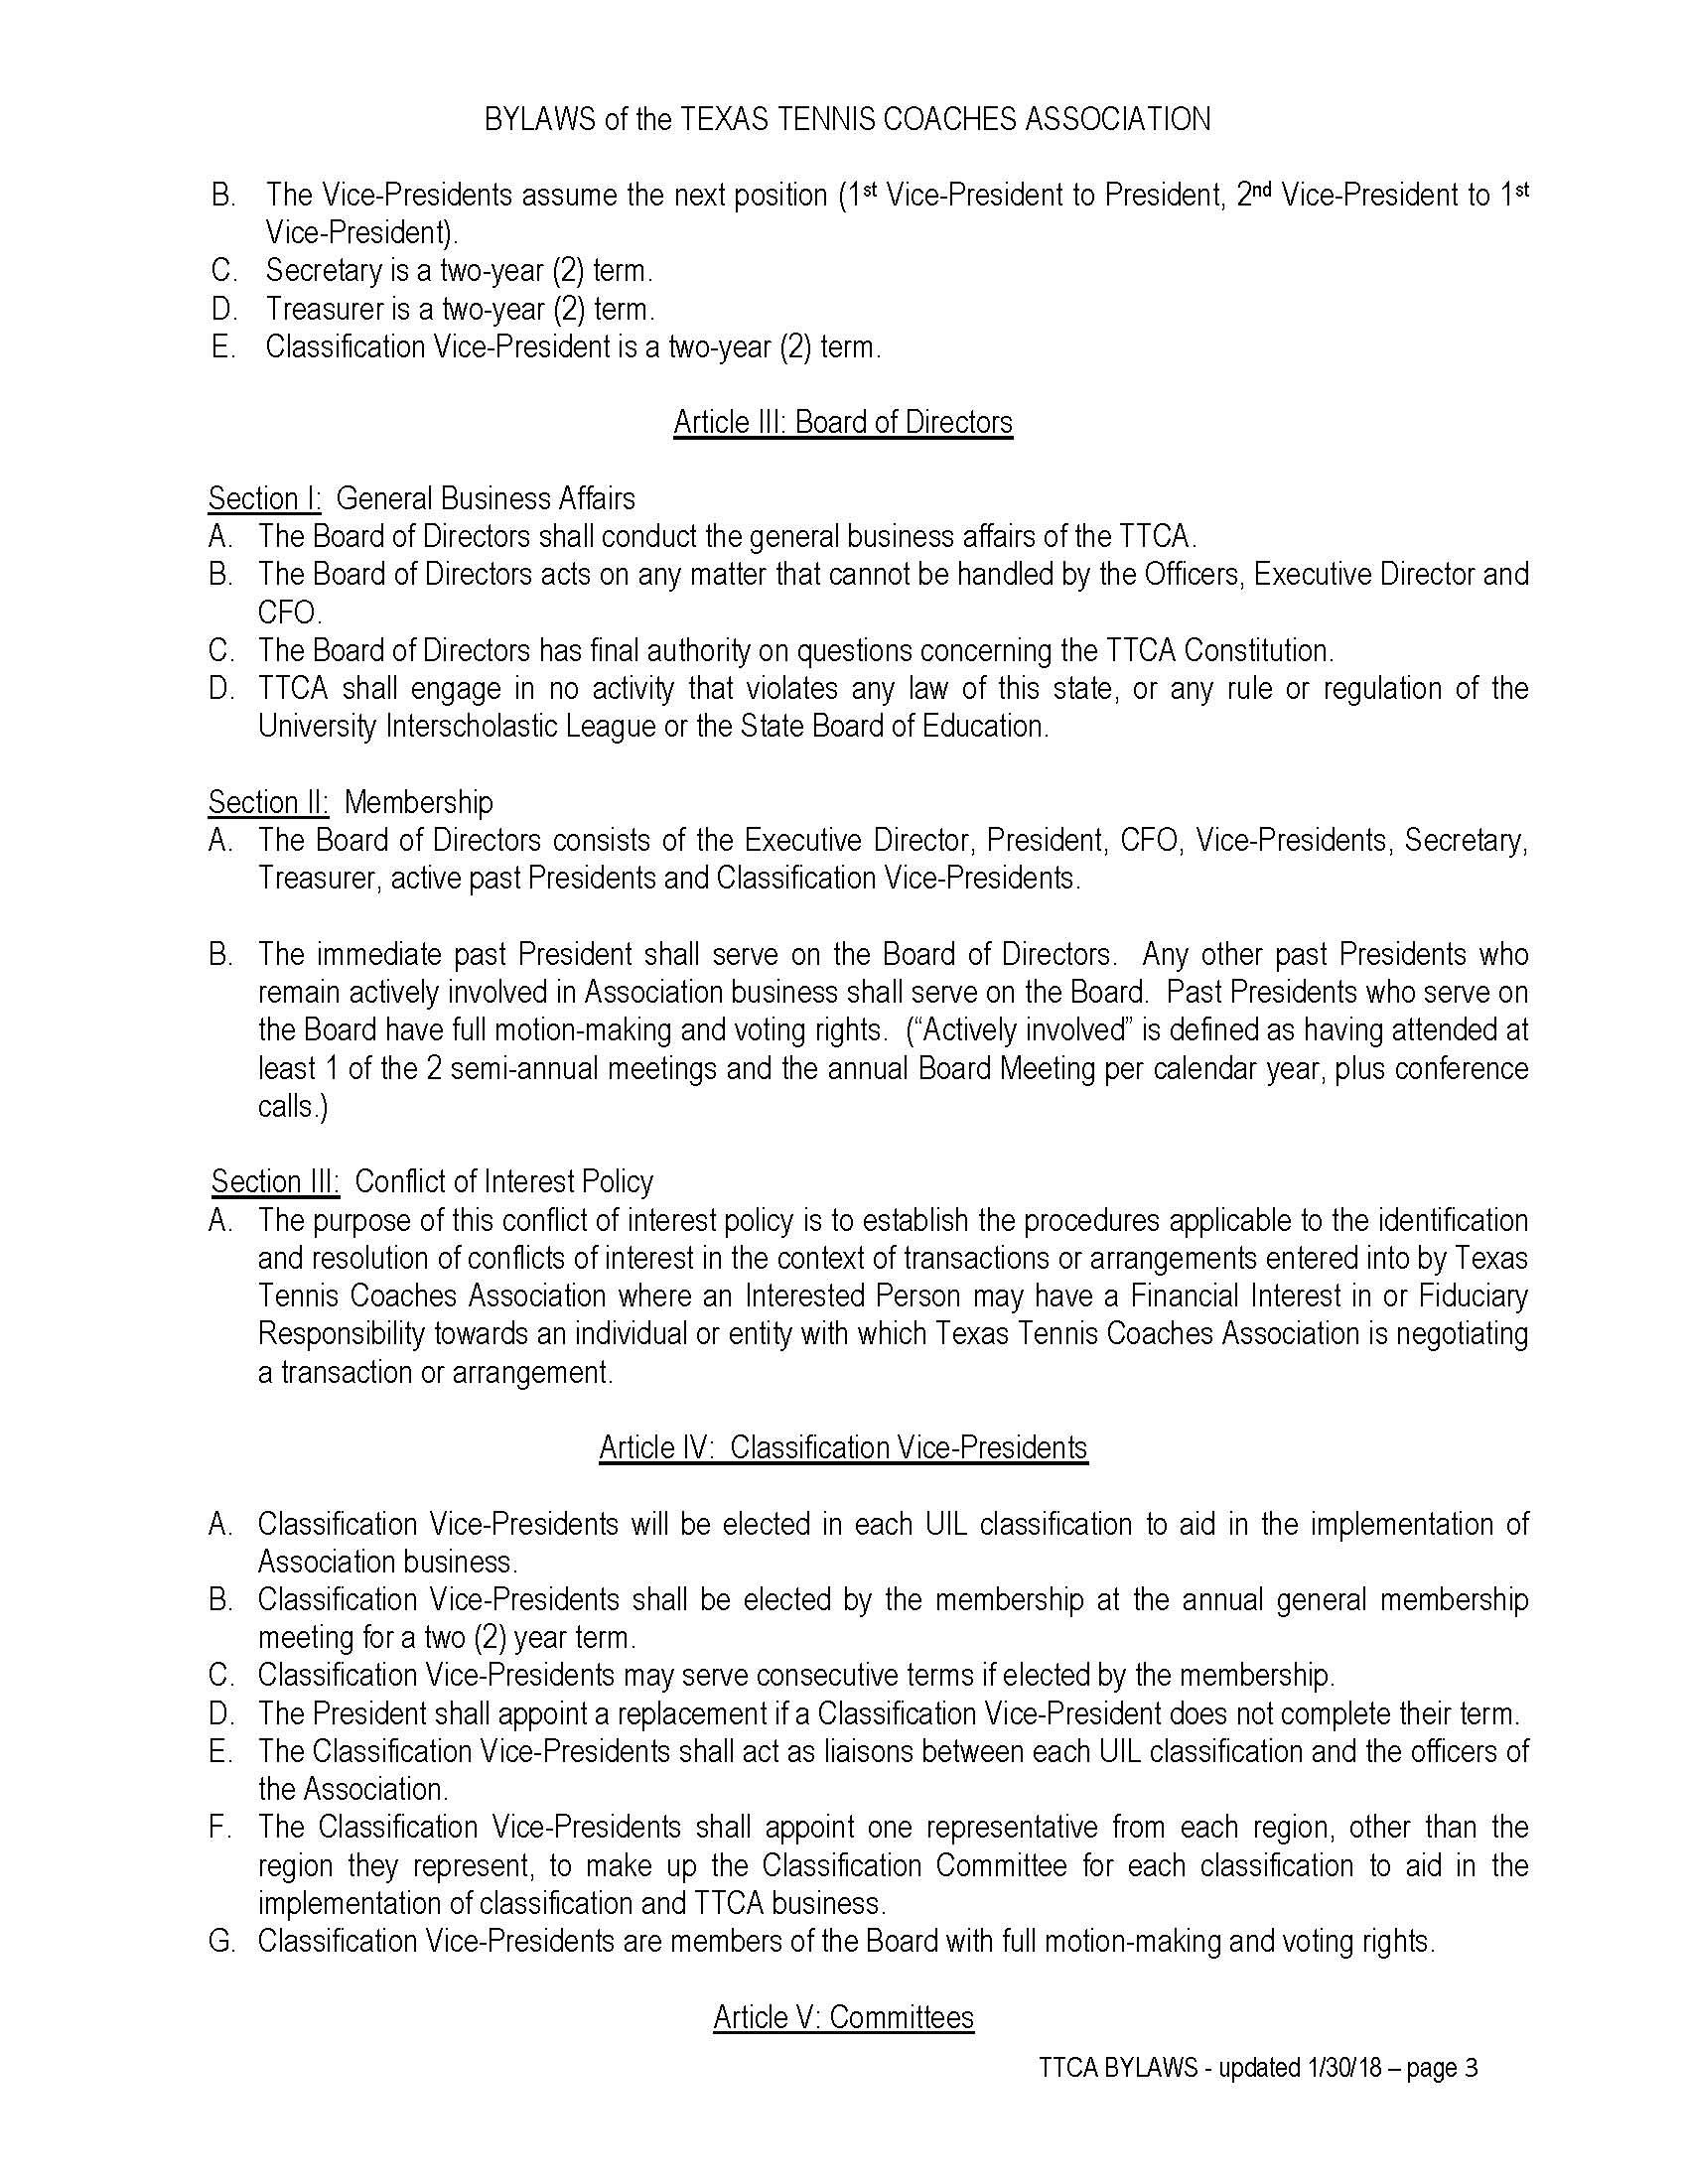 TTCA Bylaws_Page_3.jpg